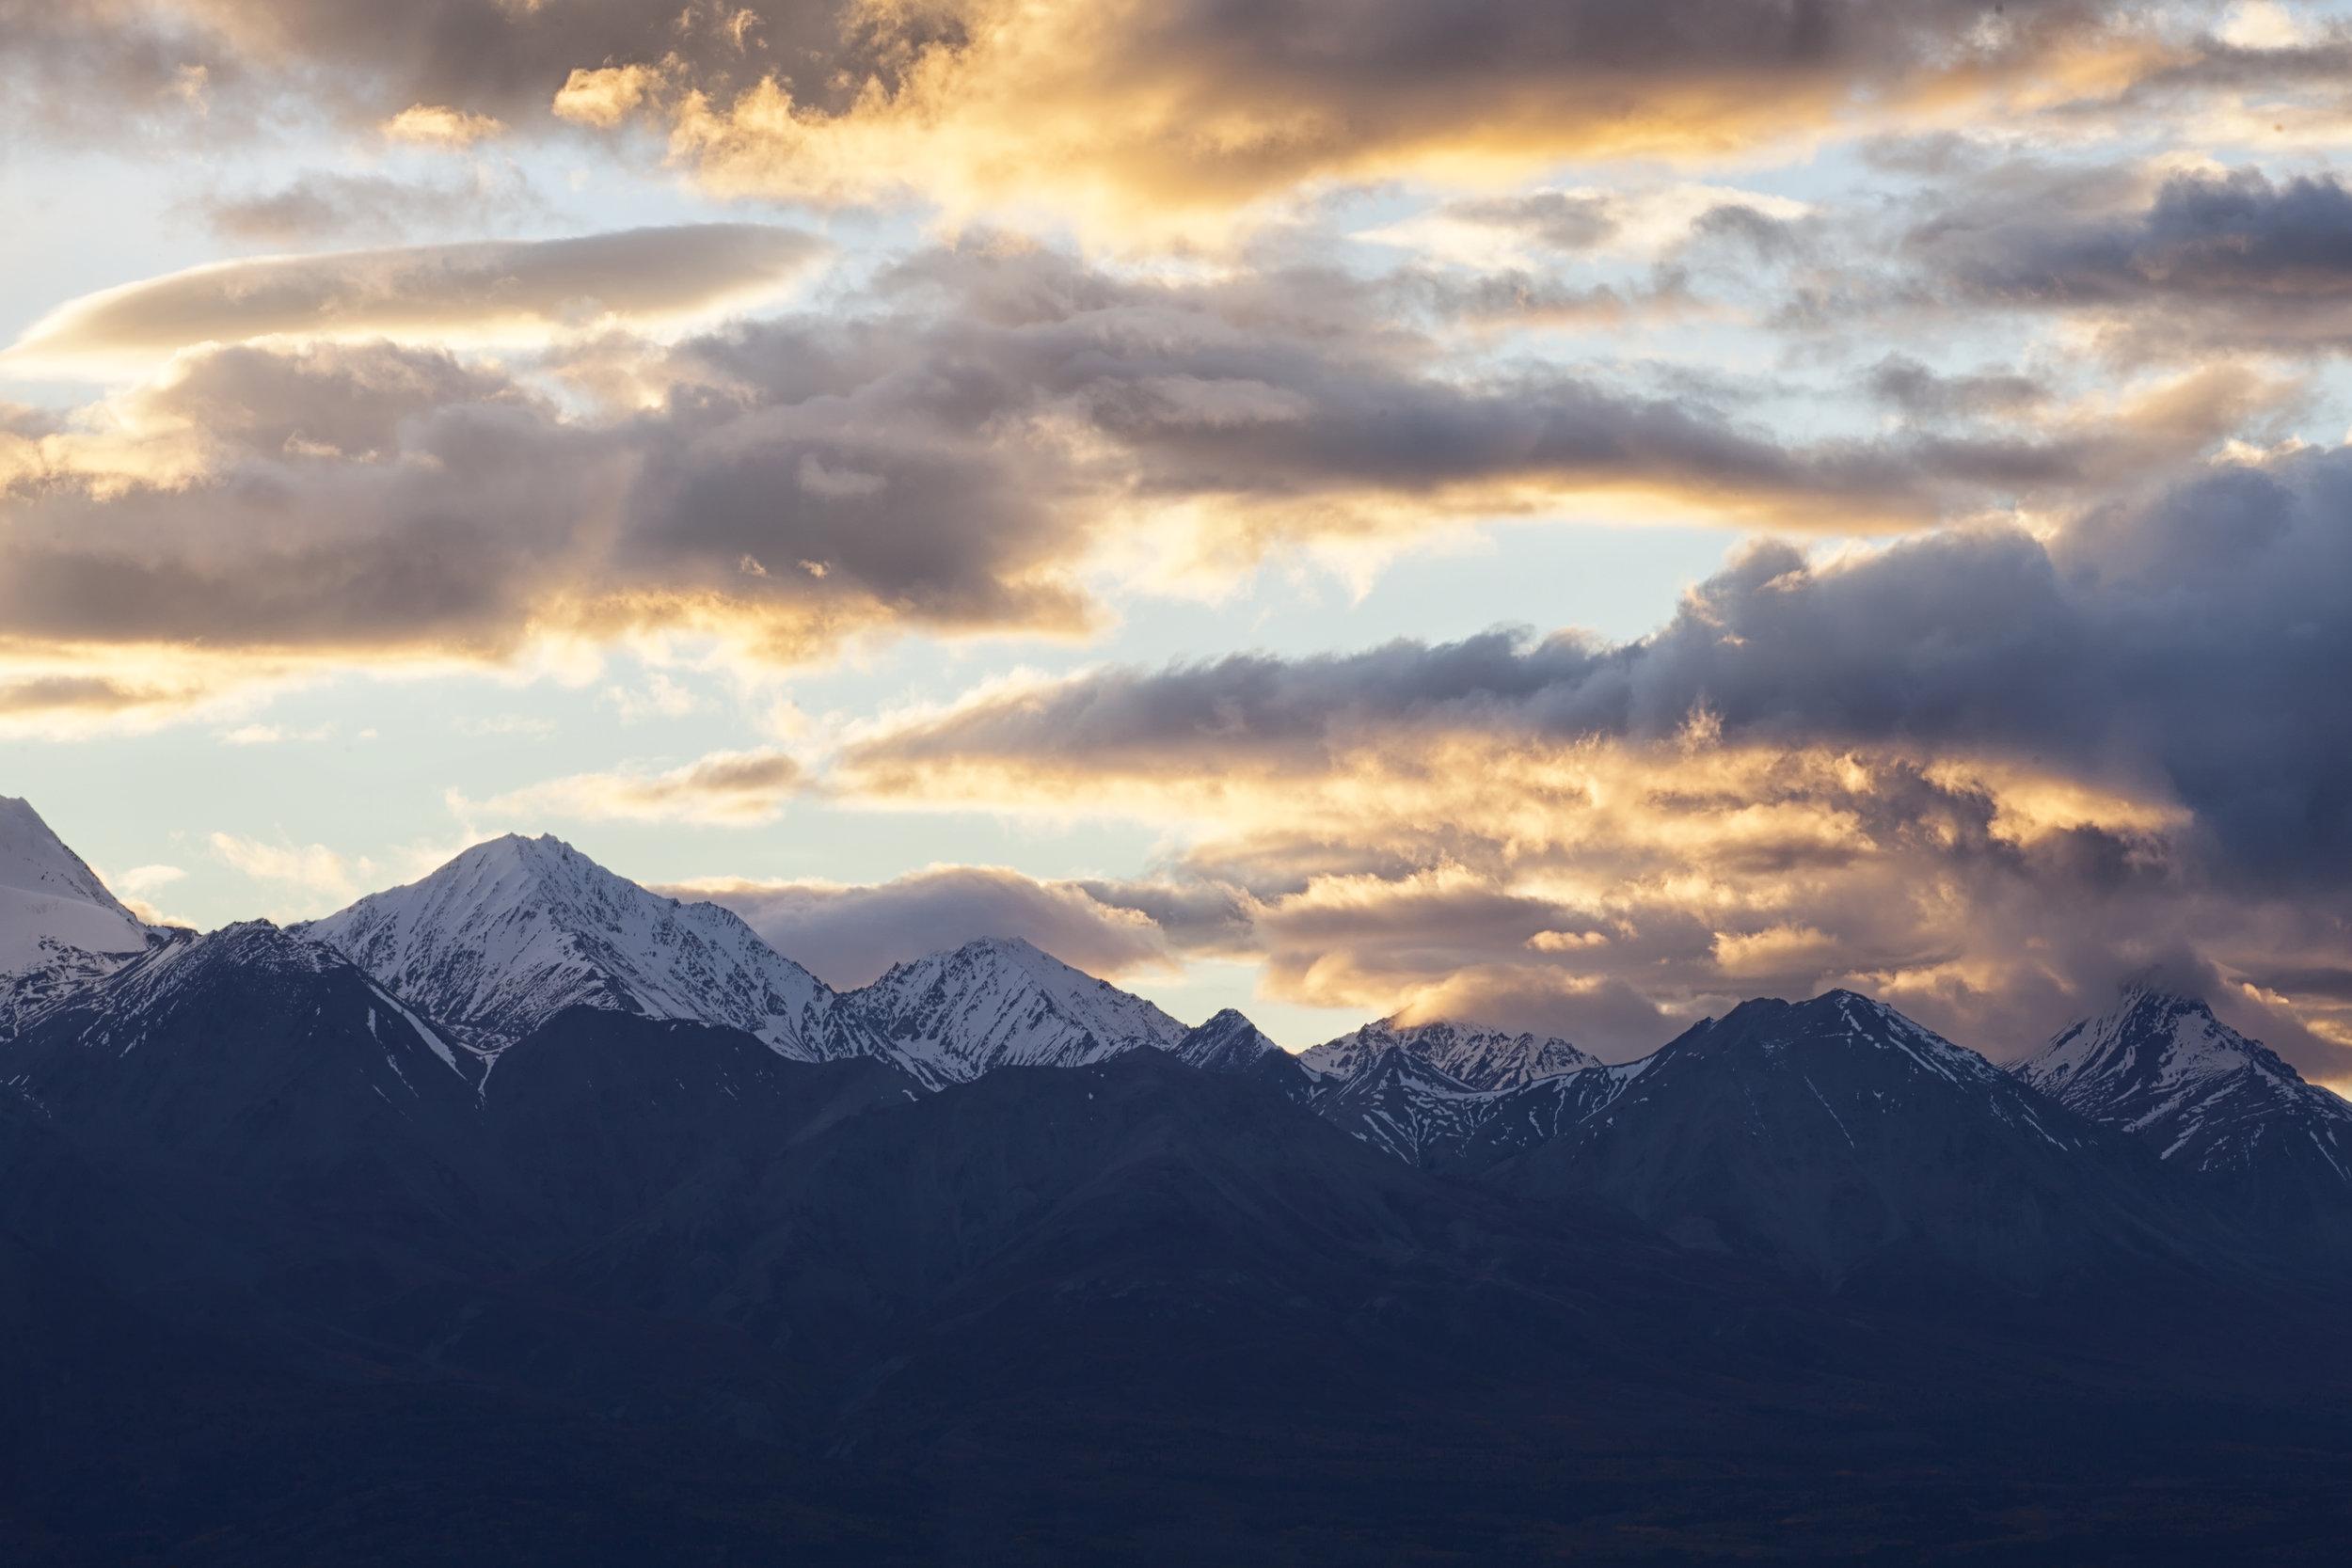 Yukon Sunset - Across the Blue Planet